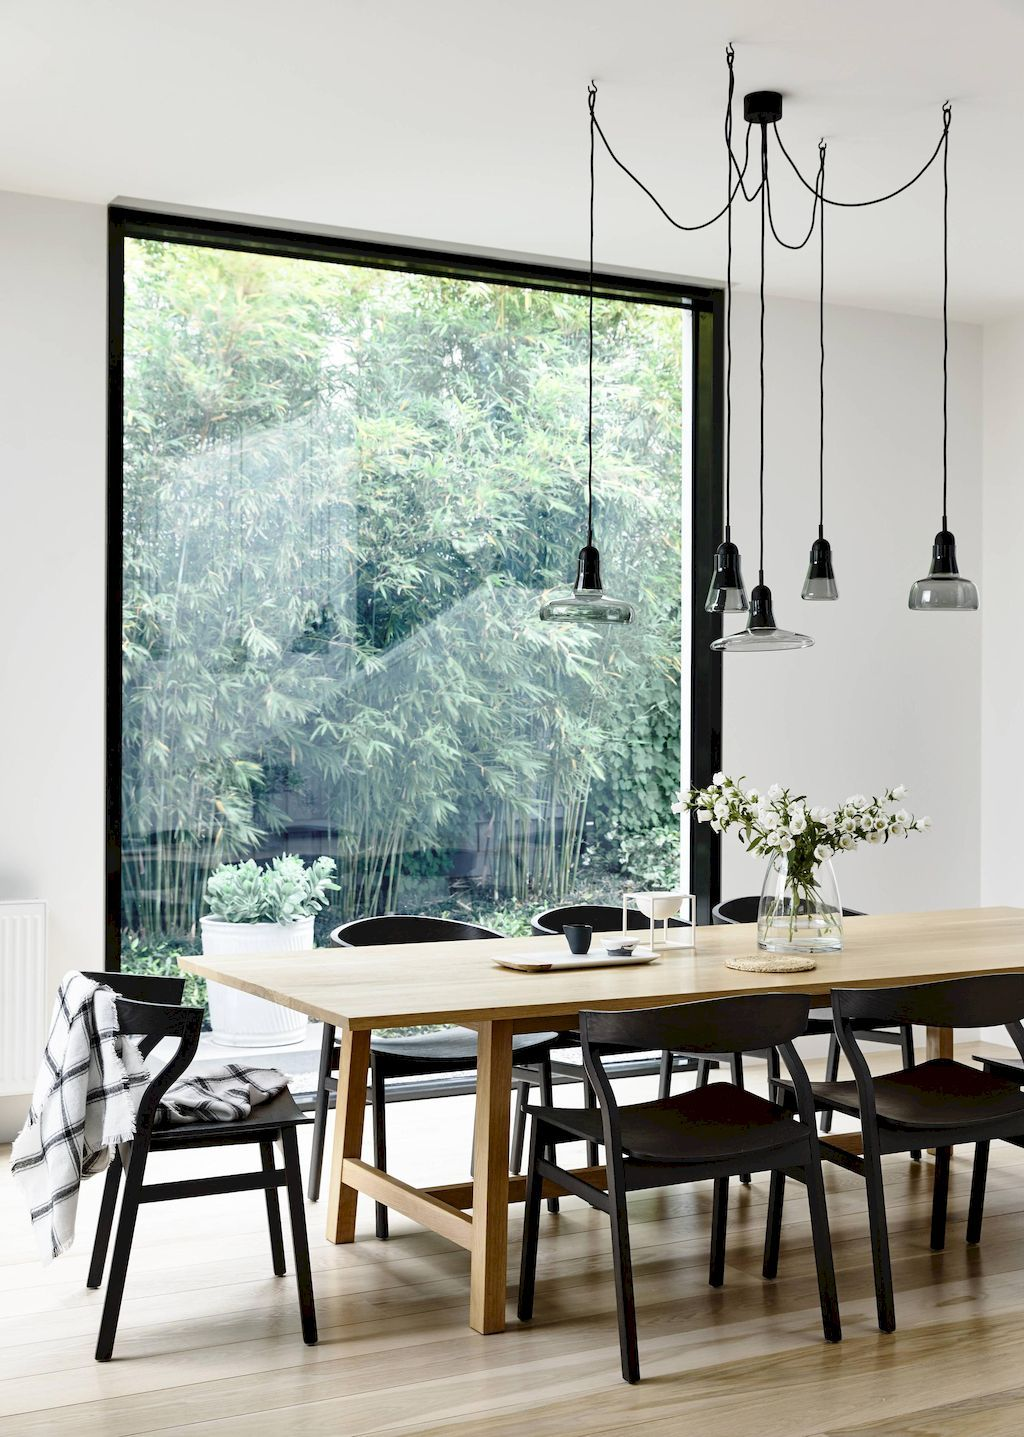 Home interior design dining room nice  modern scandinavian home interior designs